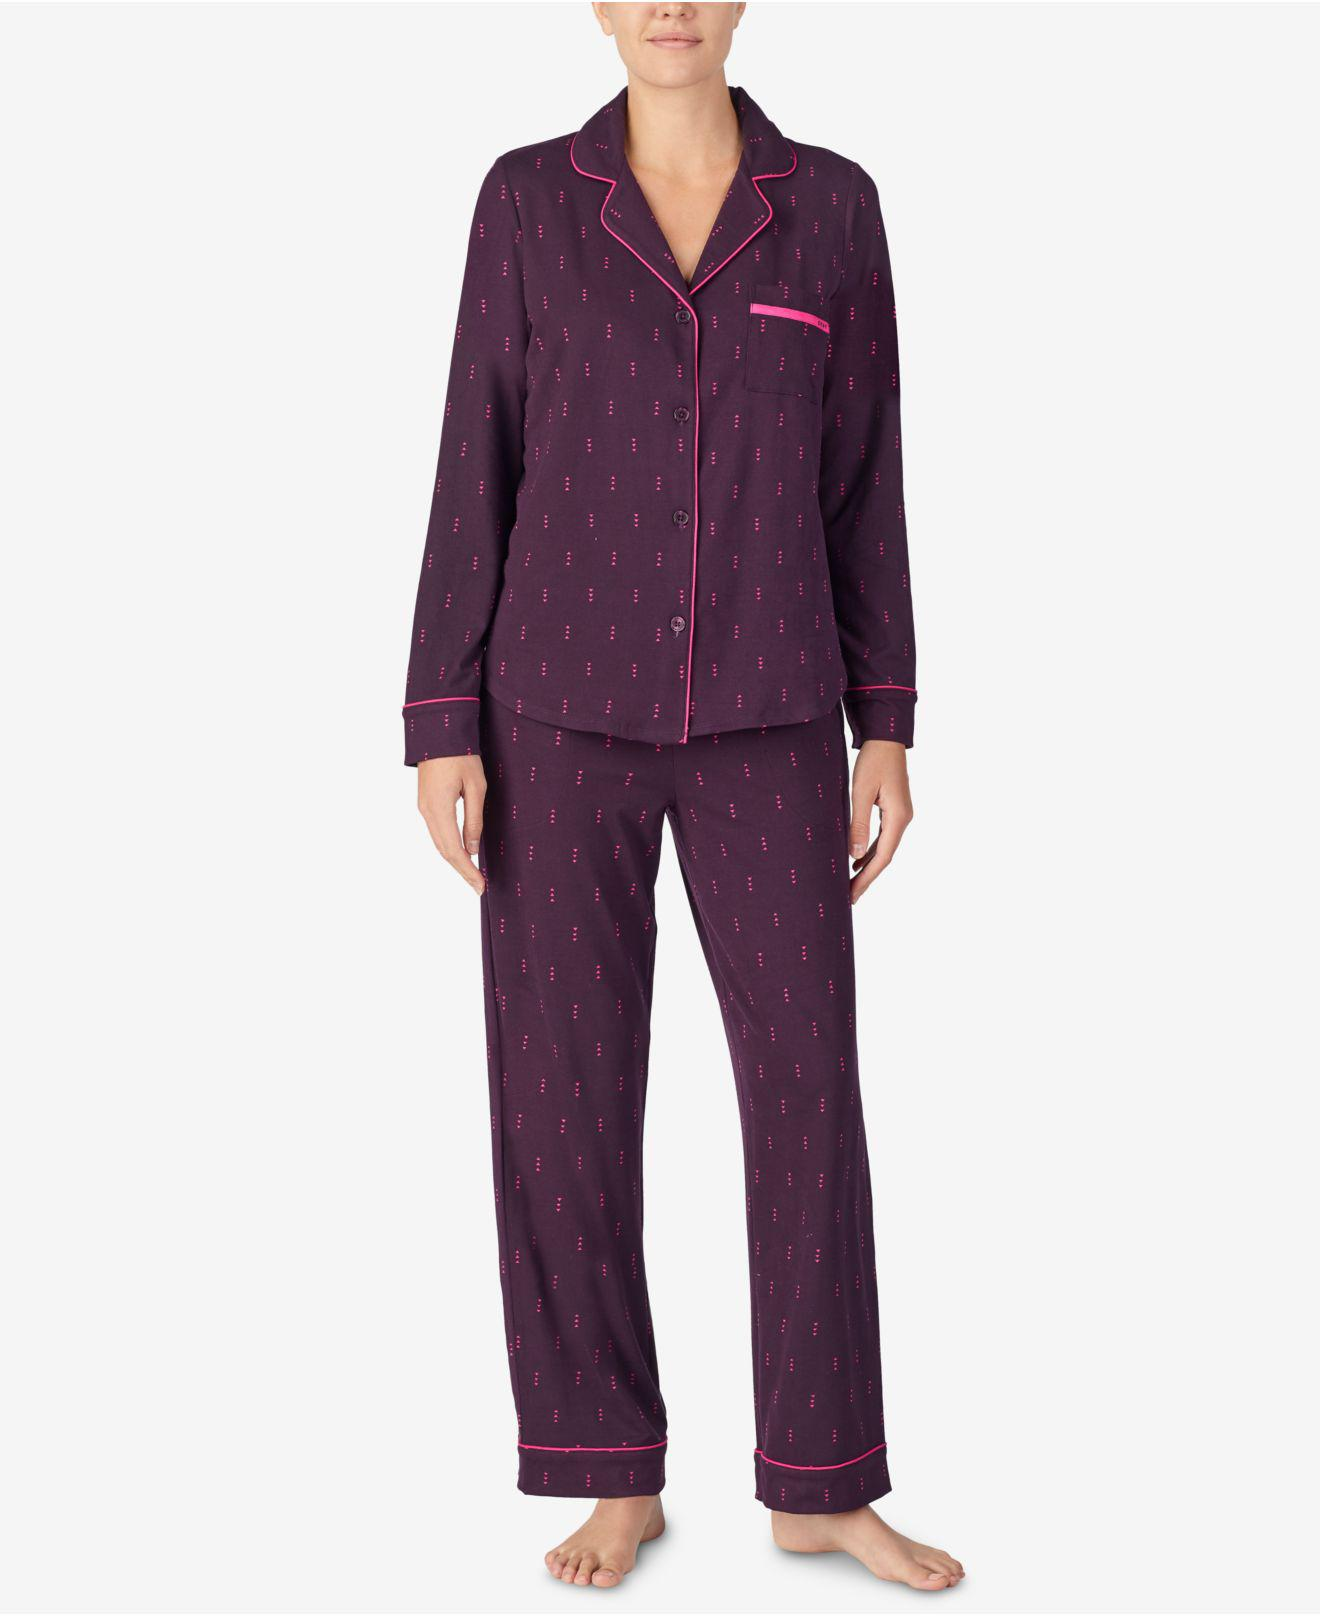 d51dcd6d7a7a Lyst - DKNY Super-soft Printed Notch Collar Pajama Set in Purple